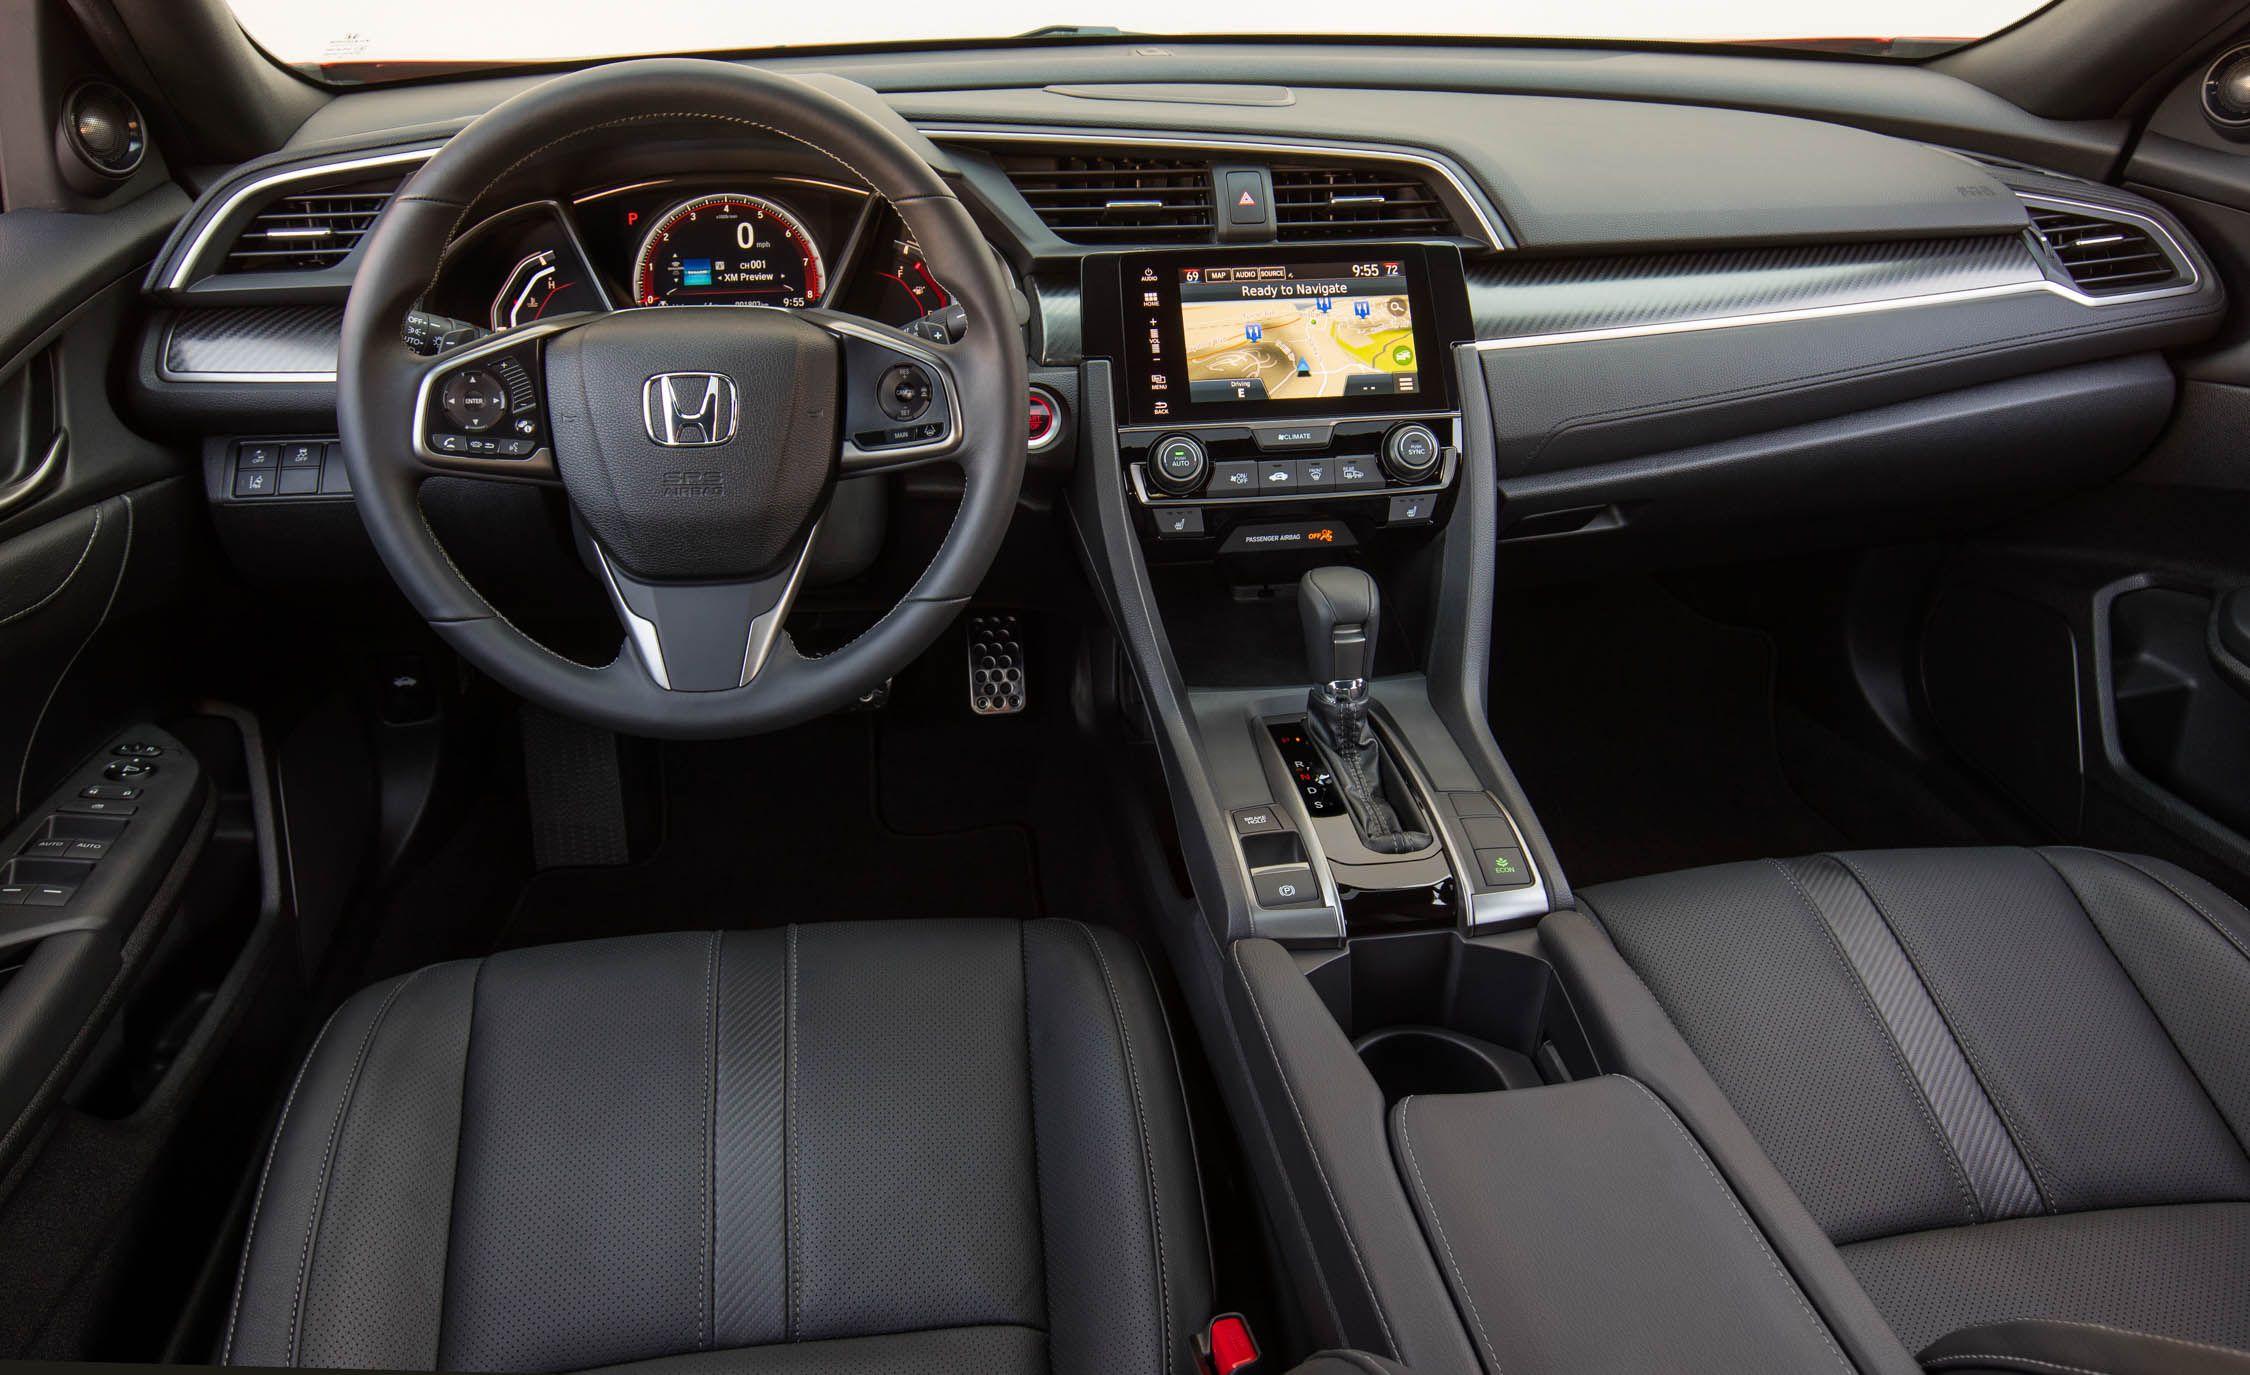 Save The Manuals Turbocharged Honda Civic Hatch Starts At 20 535